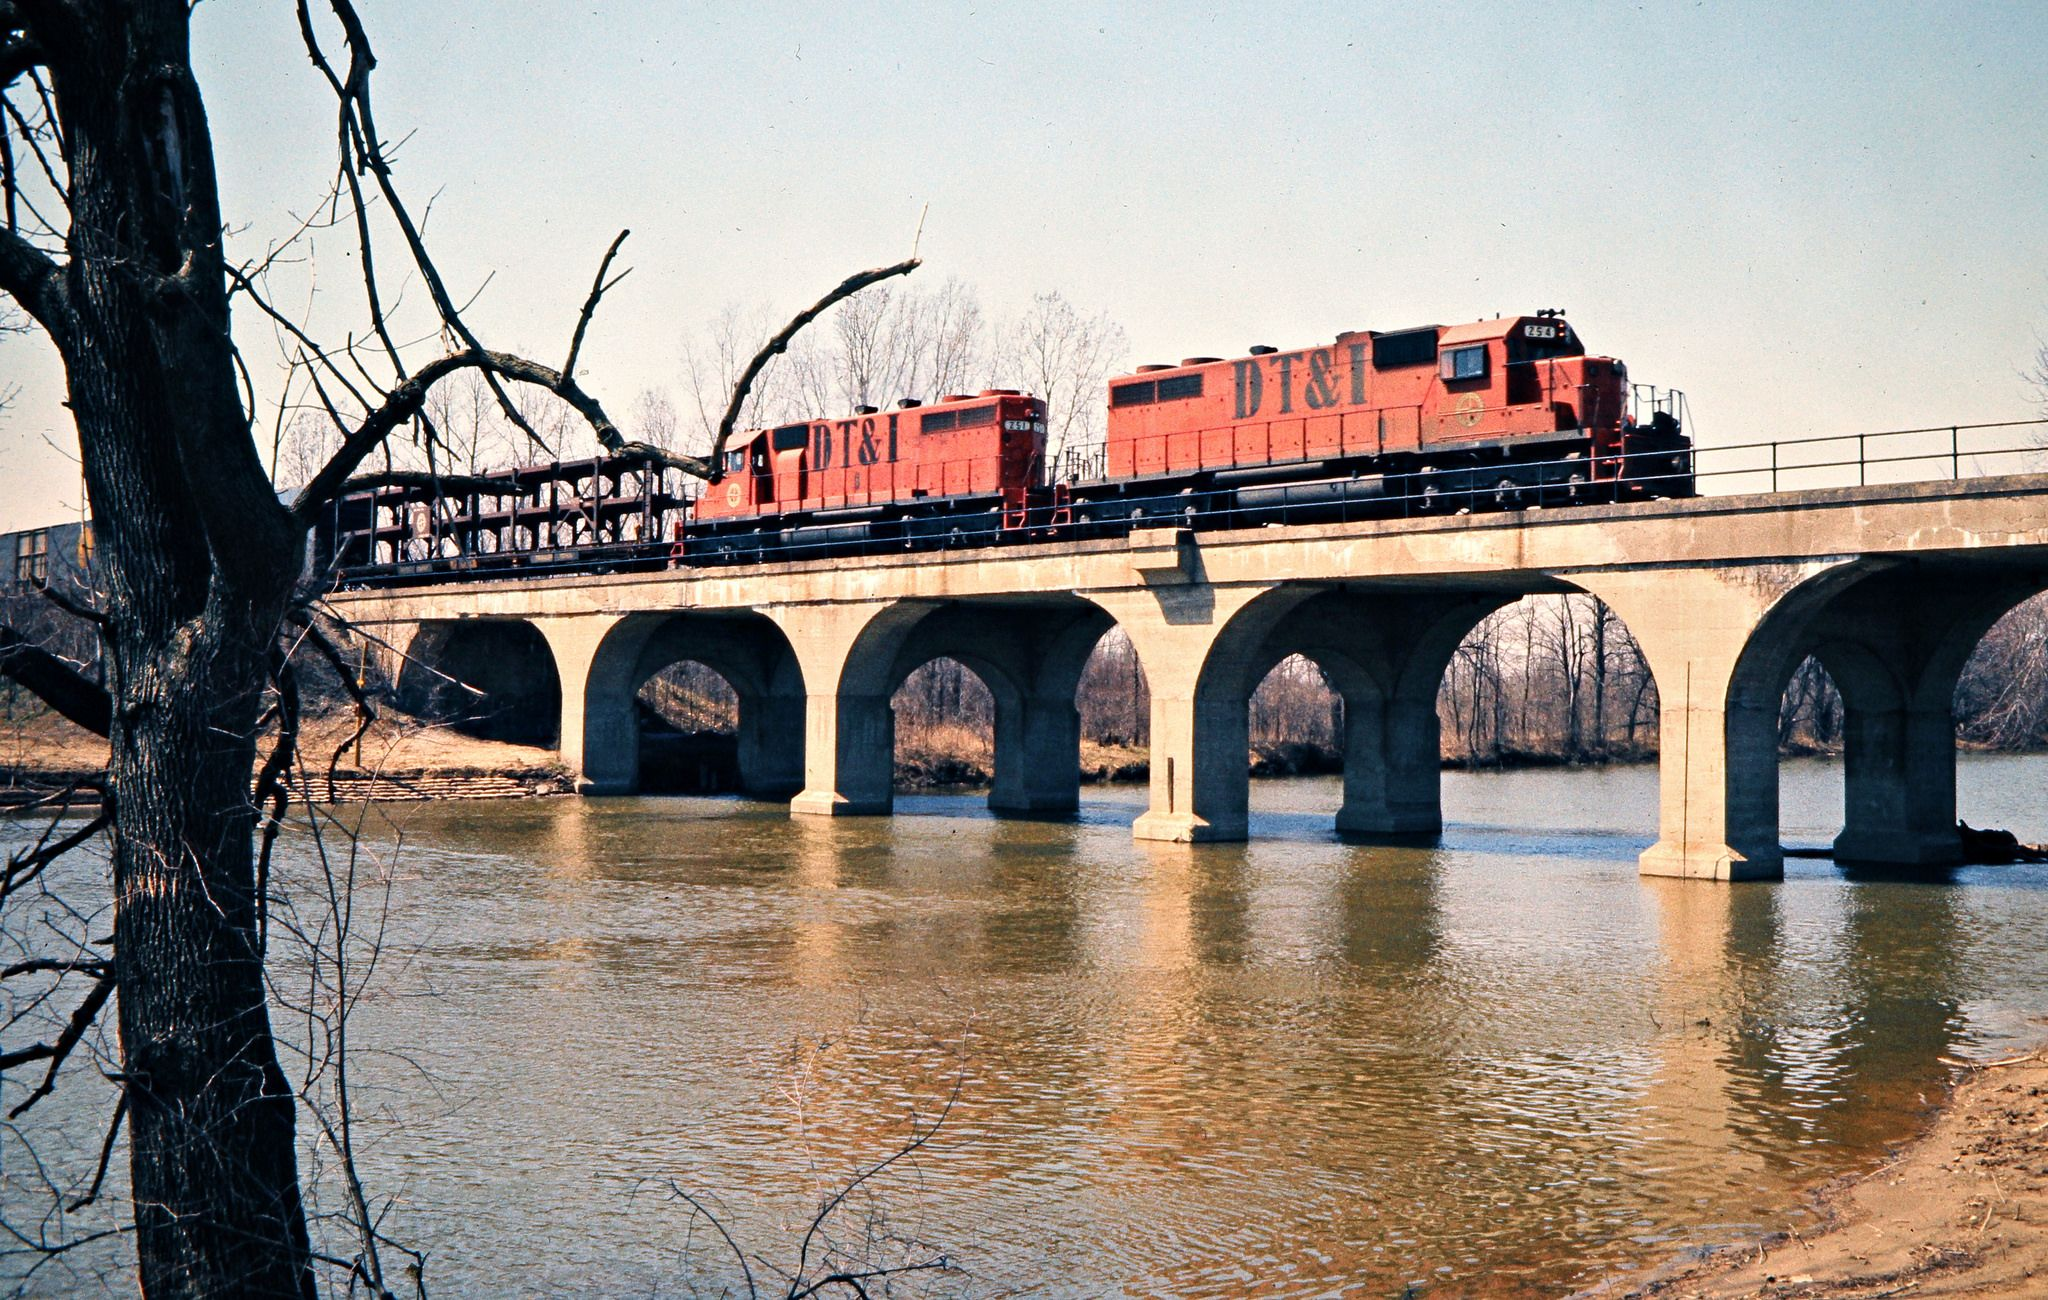 Detroit, Toledo and Ironton Railroad by John F. Bjorklund